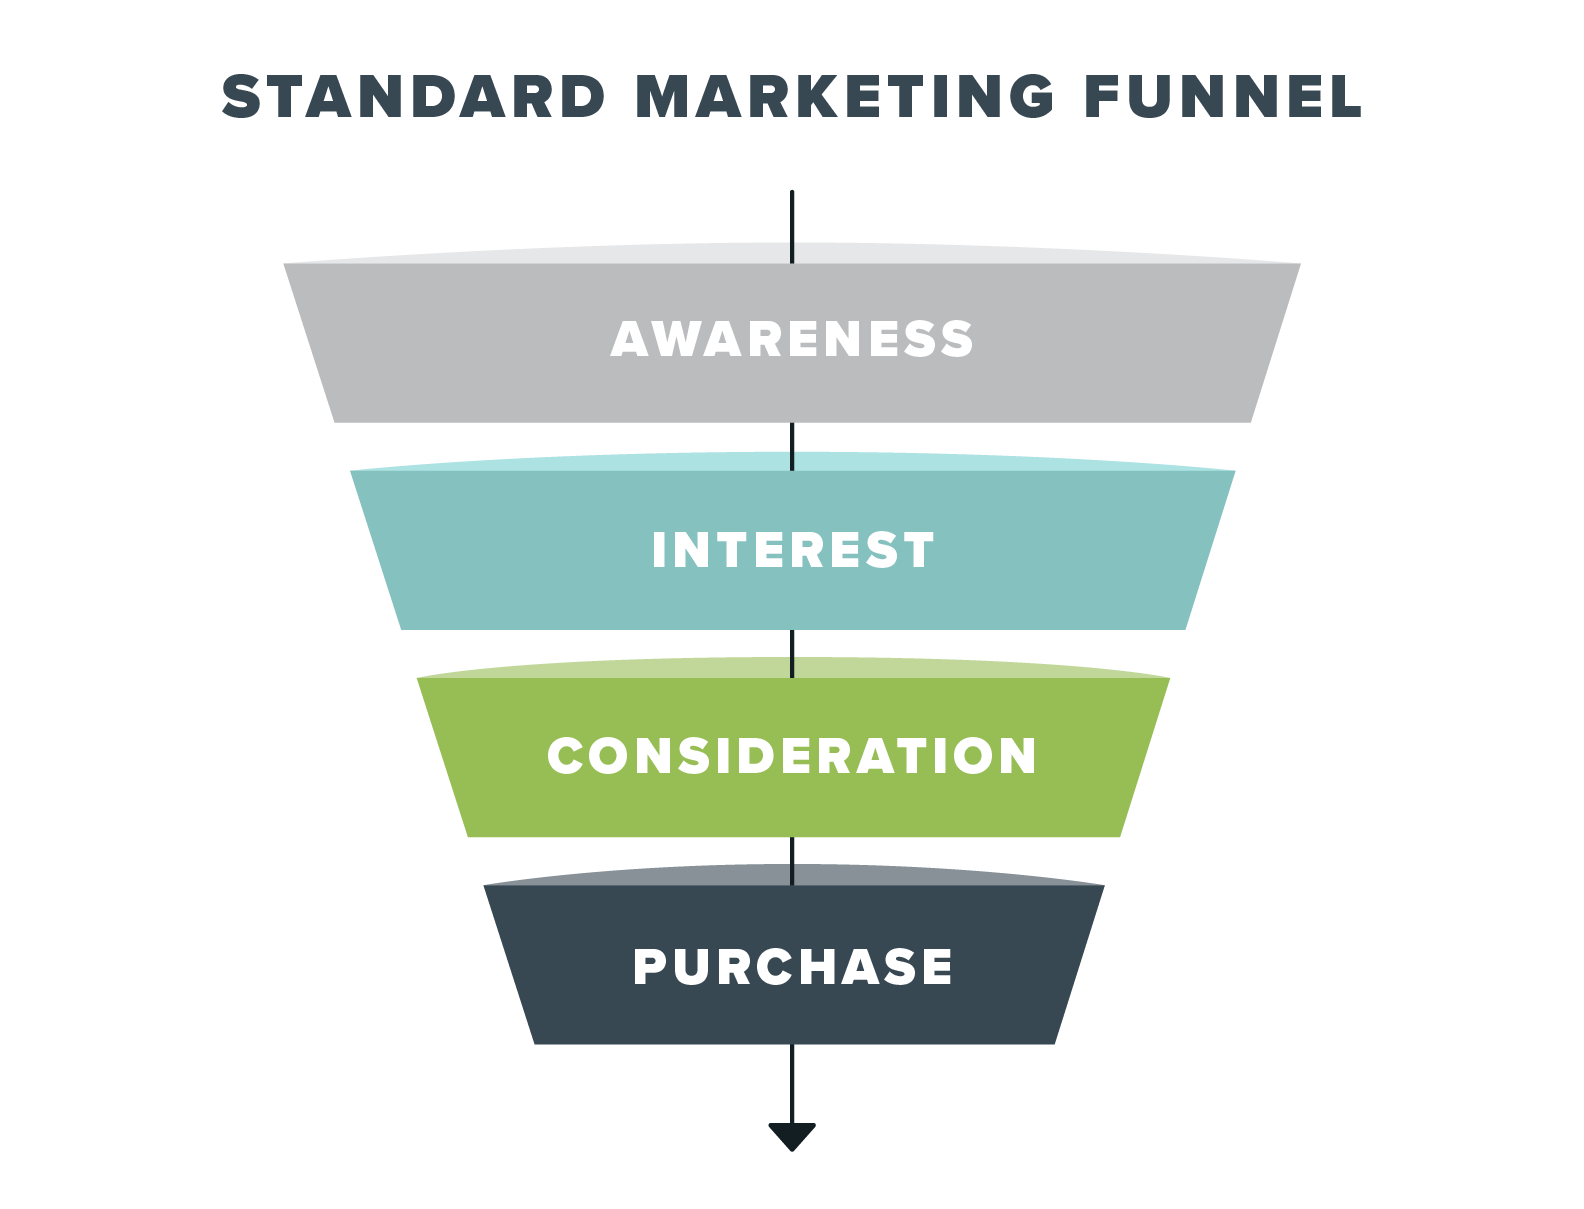 Standard marketing funnel